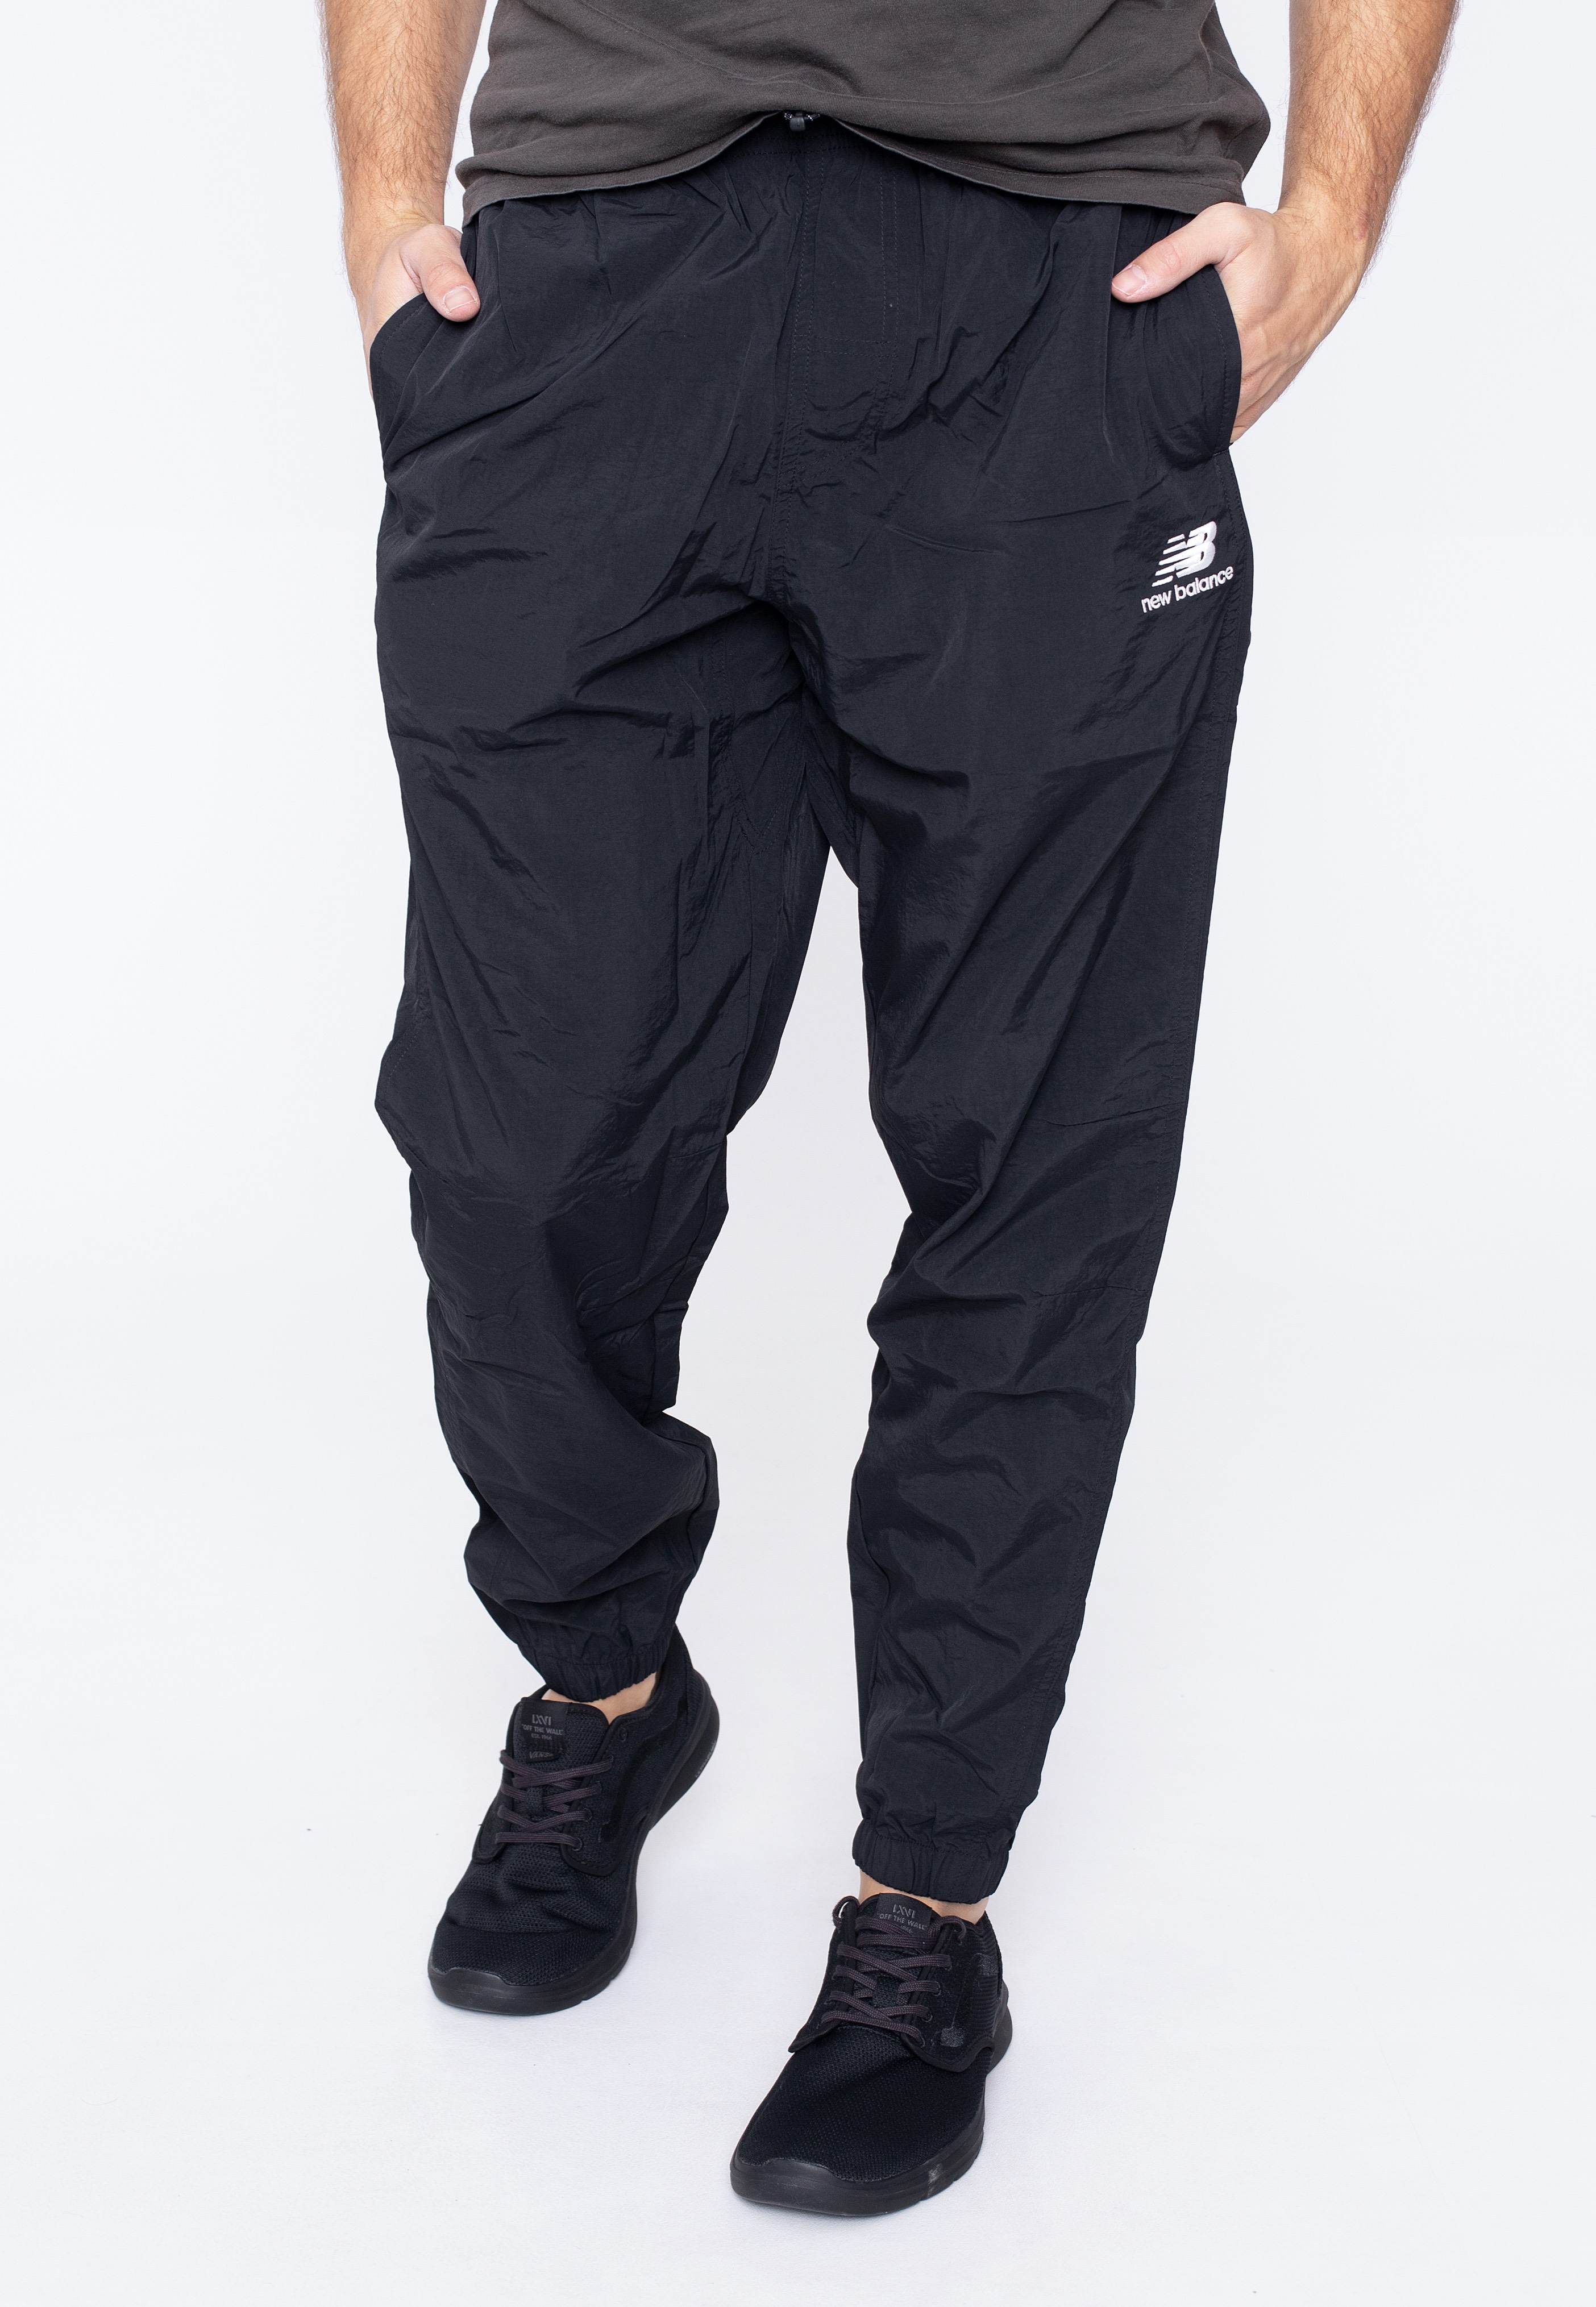 New Balance - MP13500 Black - Pants